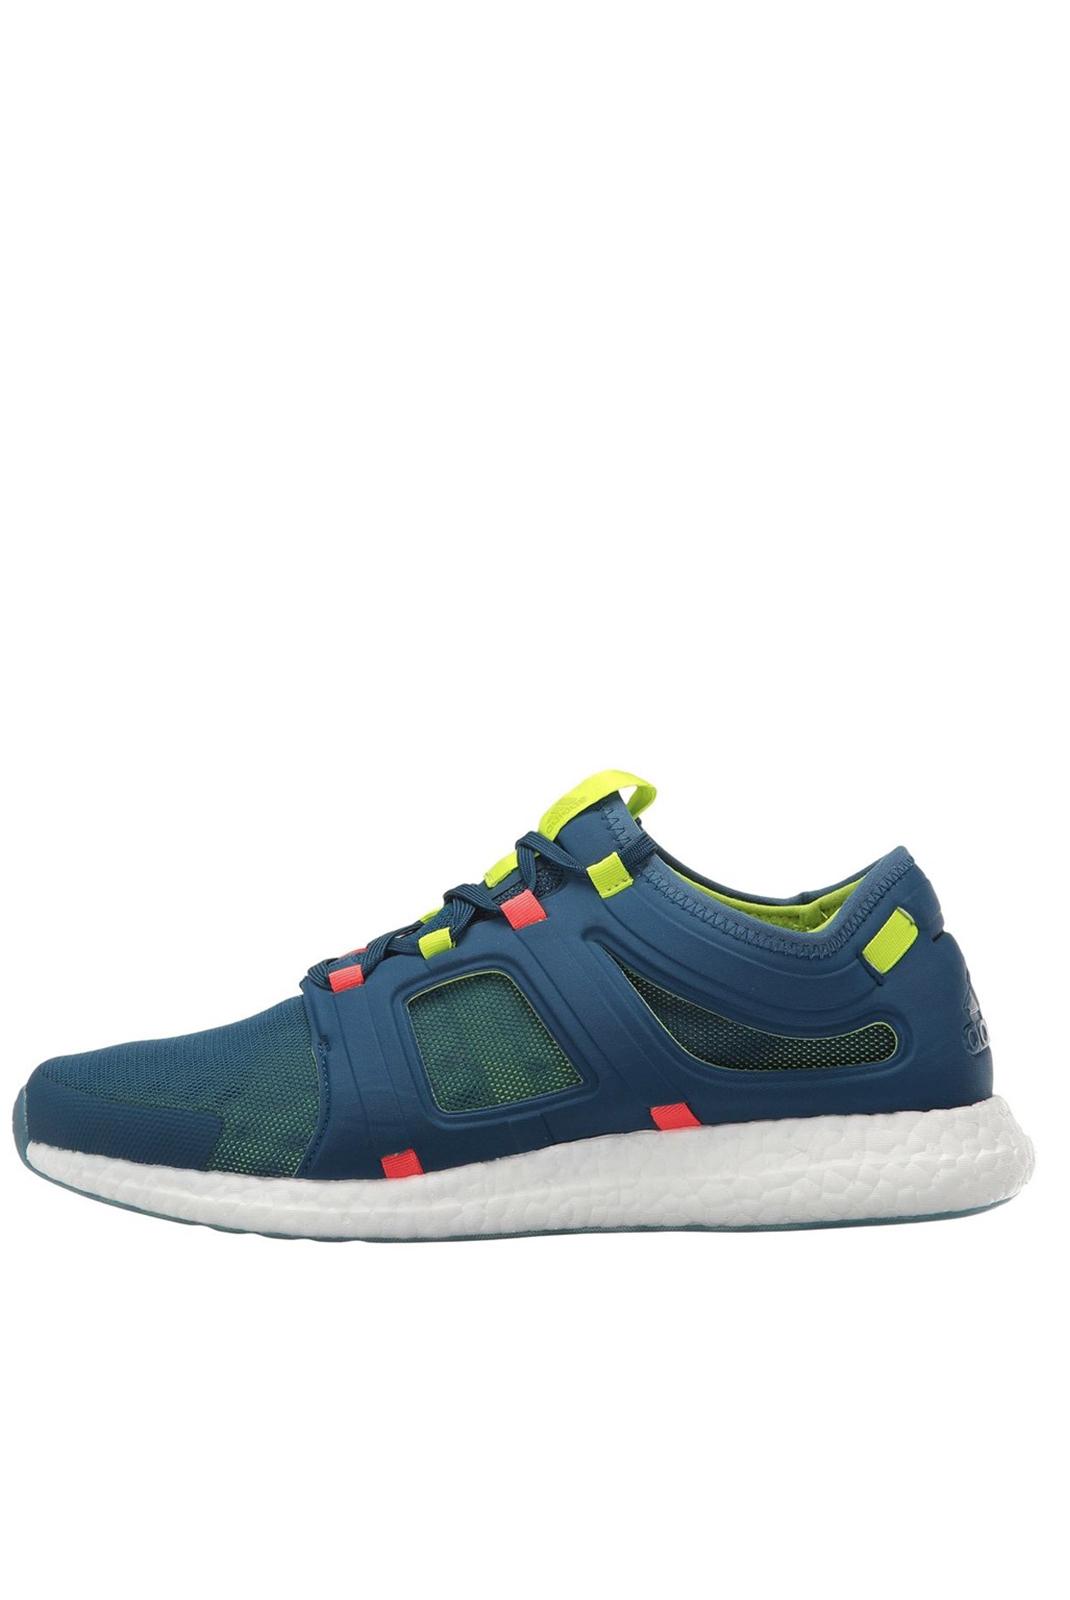 Baskets / Sport  Adidas S74462 cc rocket m BLUE